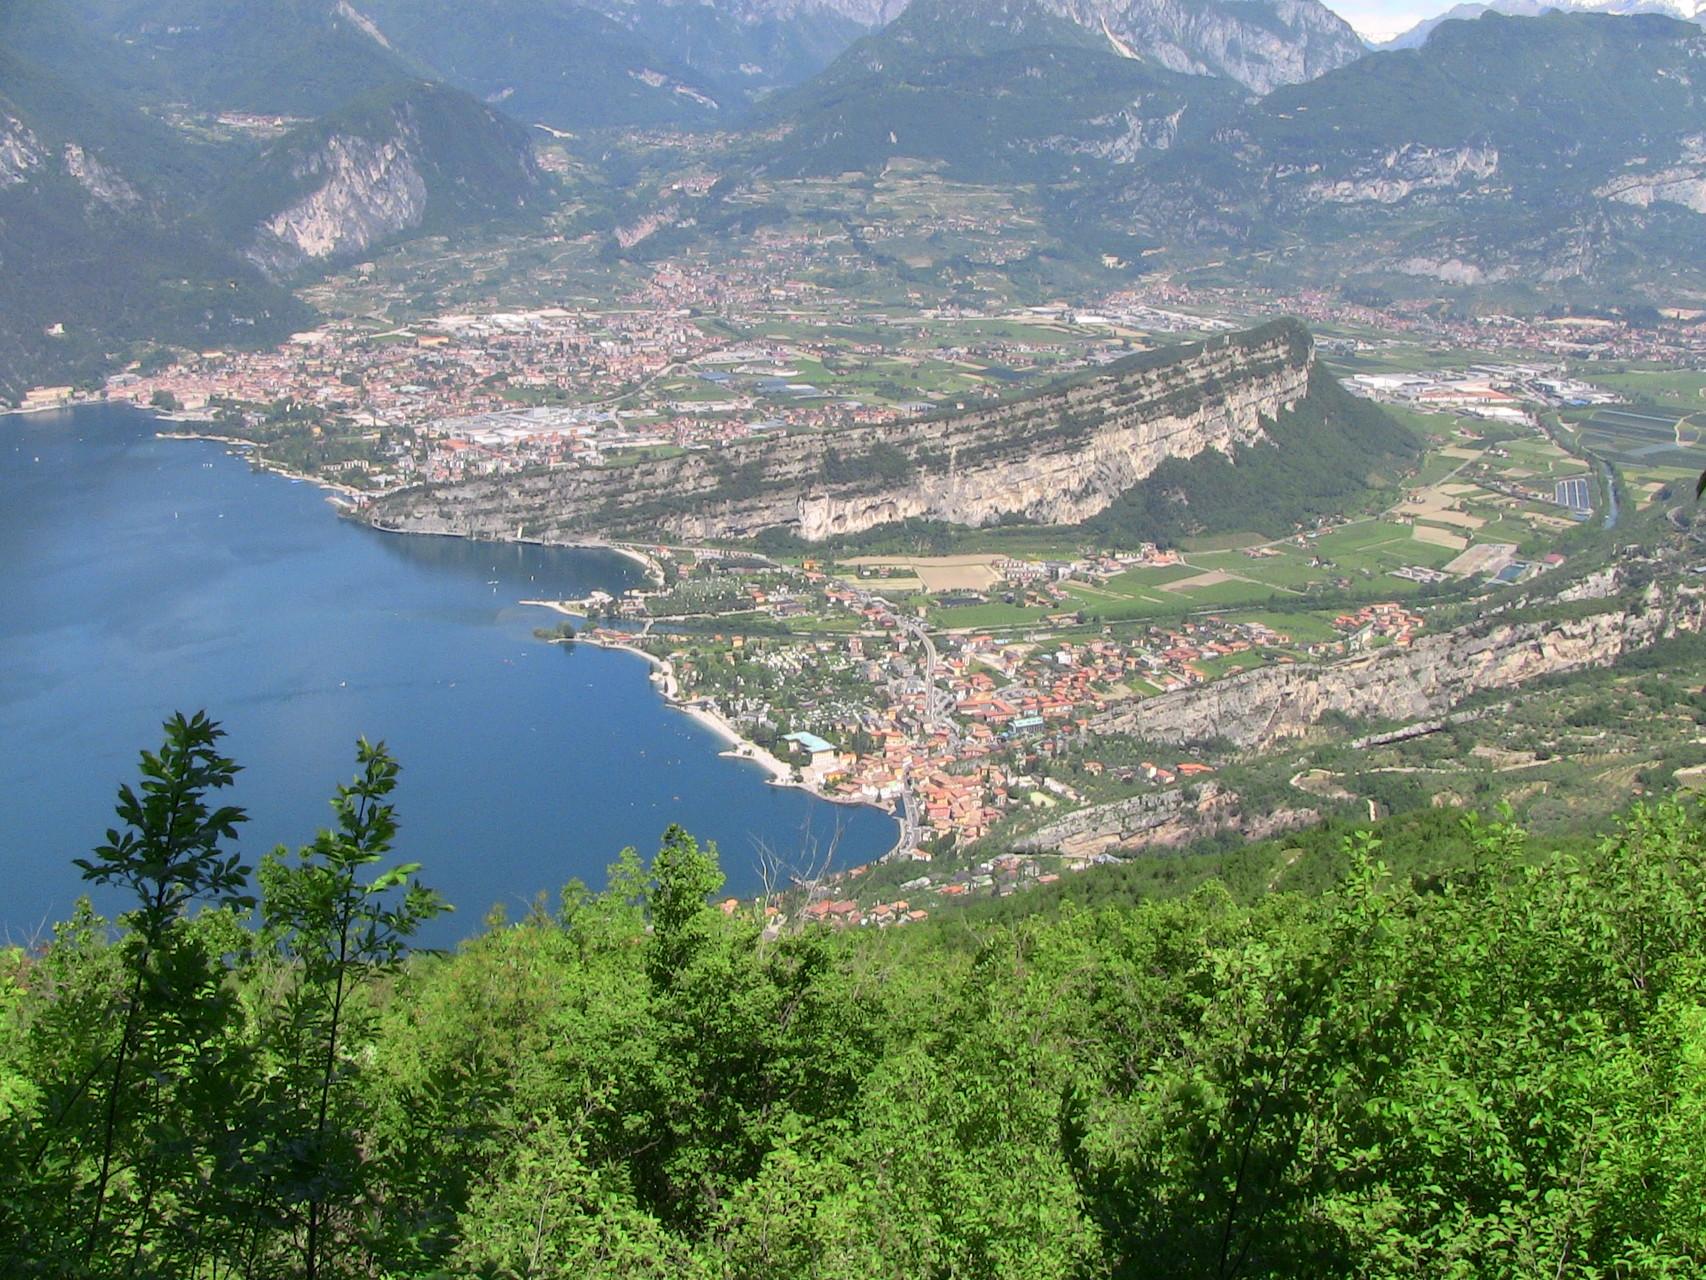 Blich auf Riva - Monte Brione - Torbole